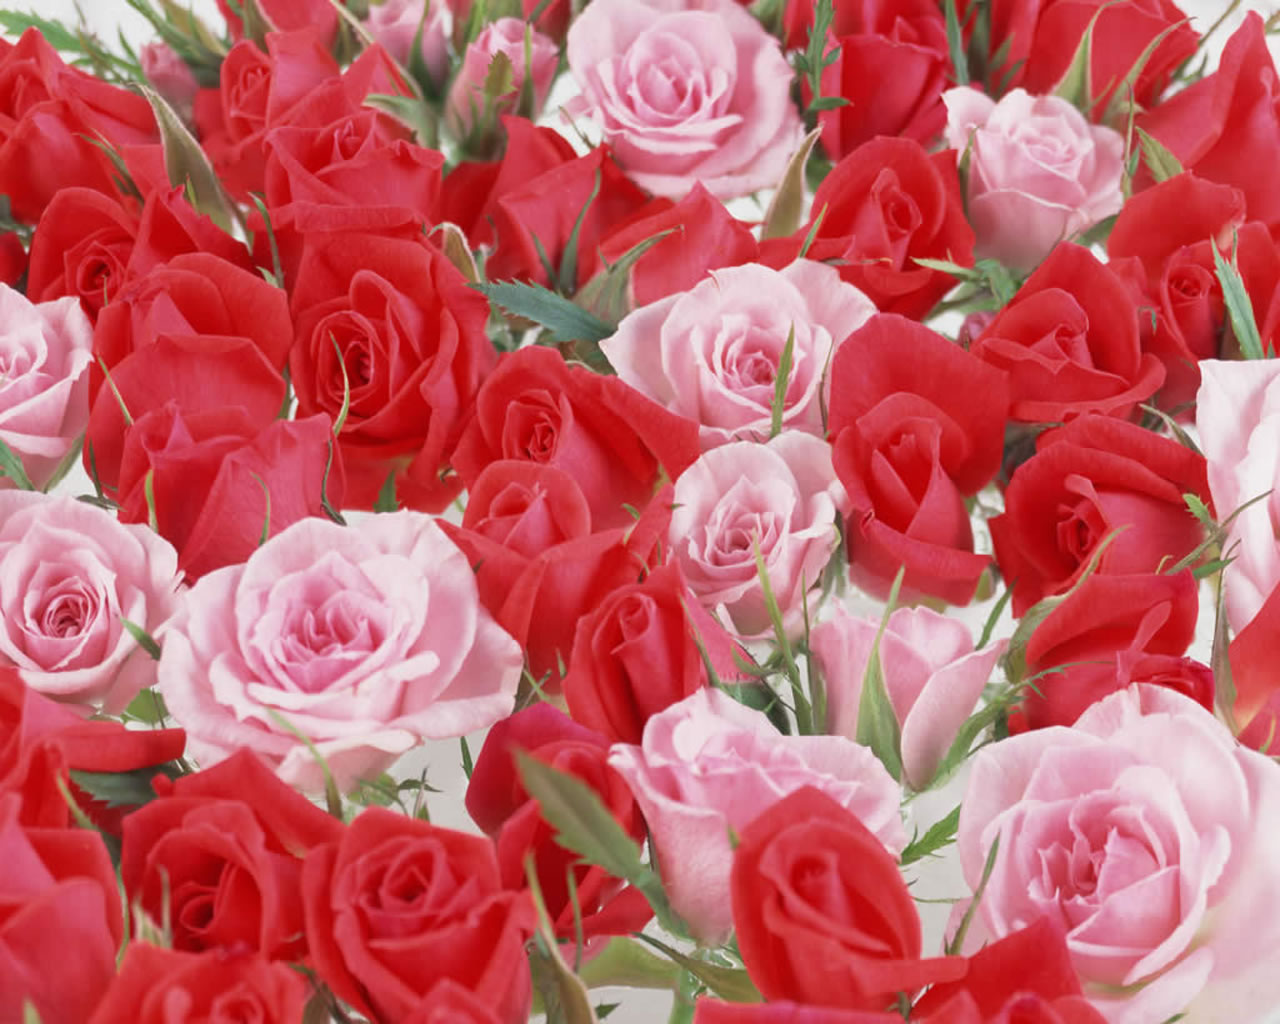 Beautiful Flowers Wallpaper Quality Hd Beautiful Flowers 1280x1024